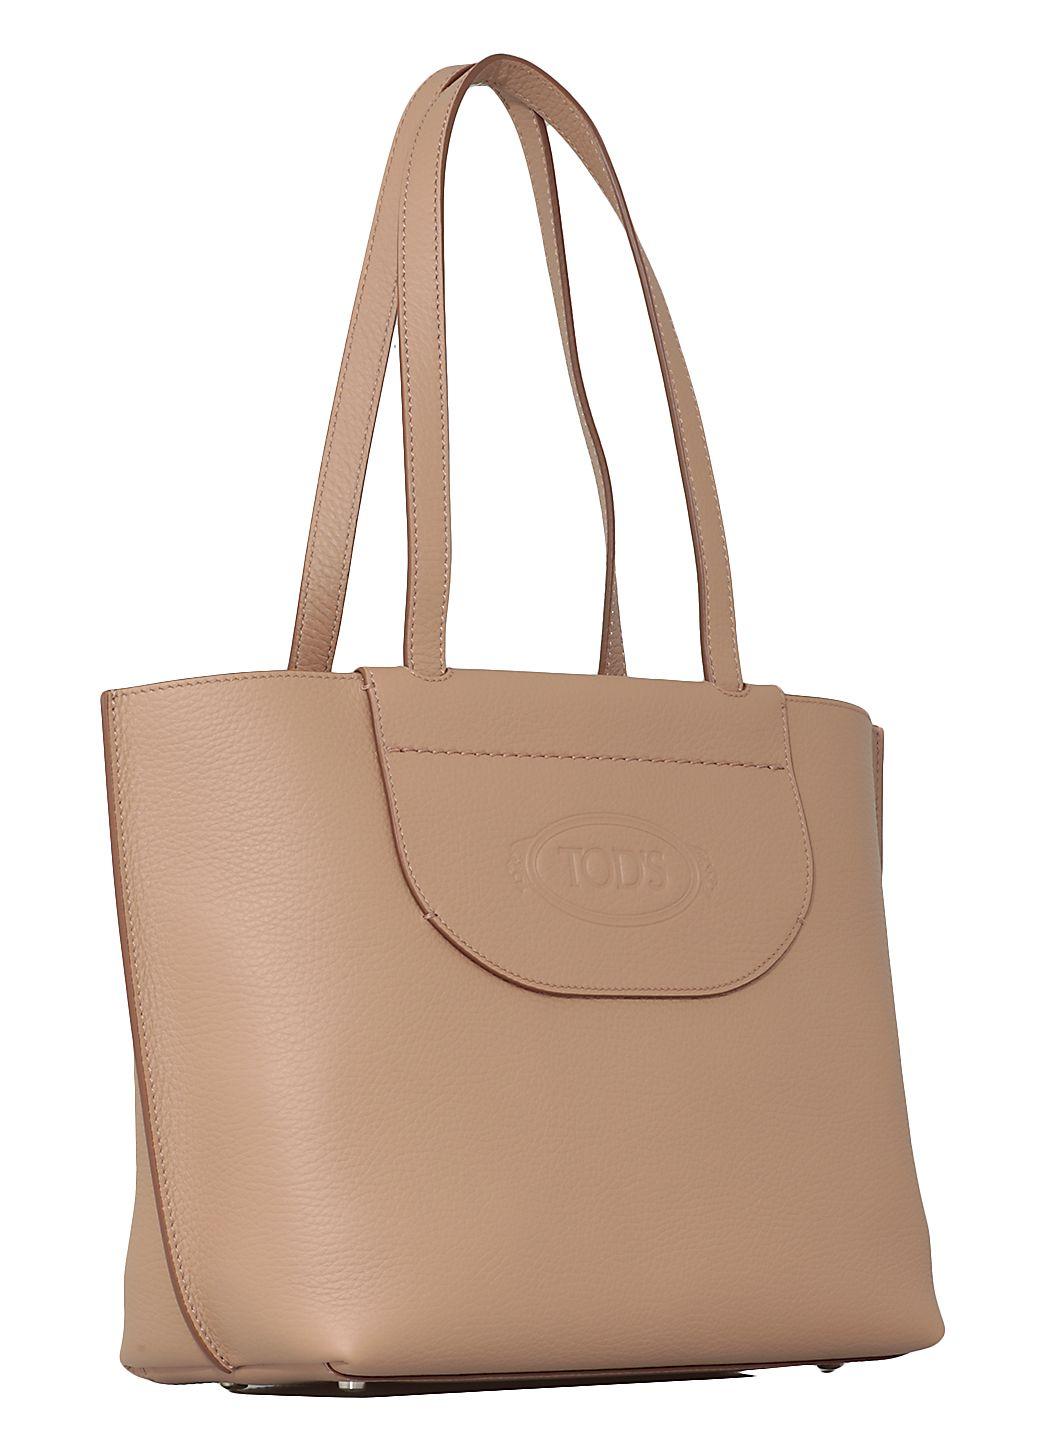 Small Aol Shopper Bag